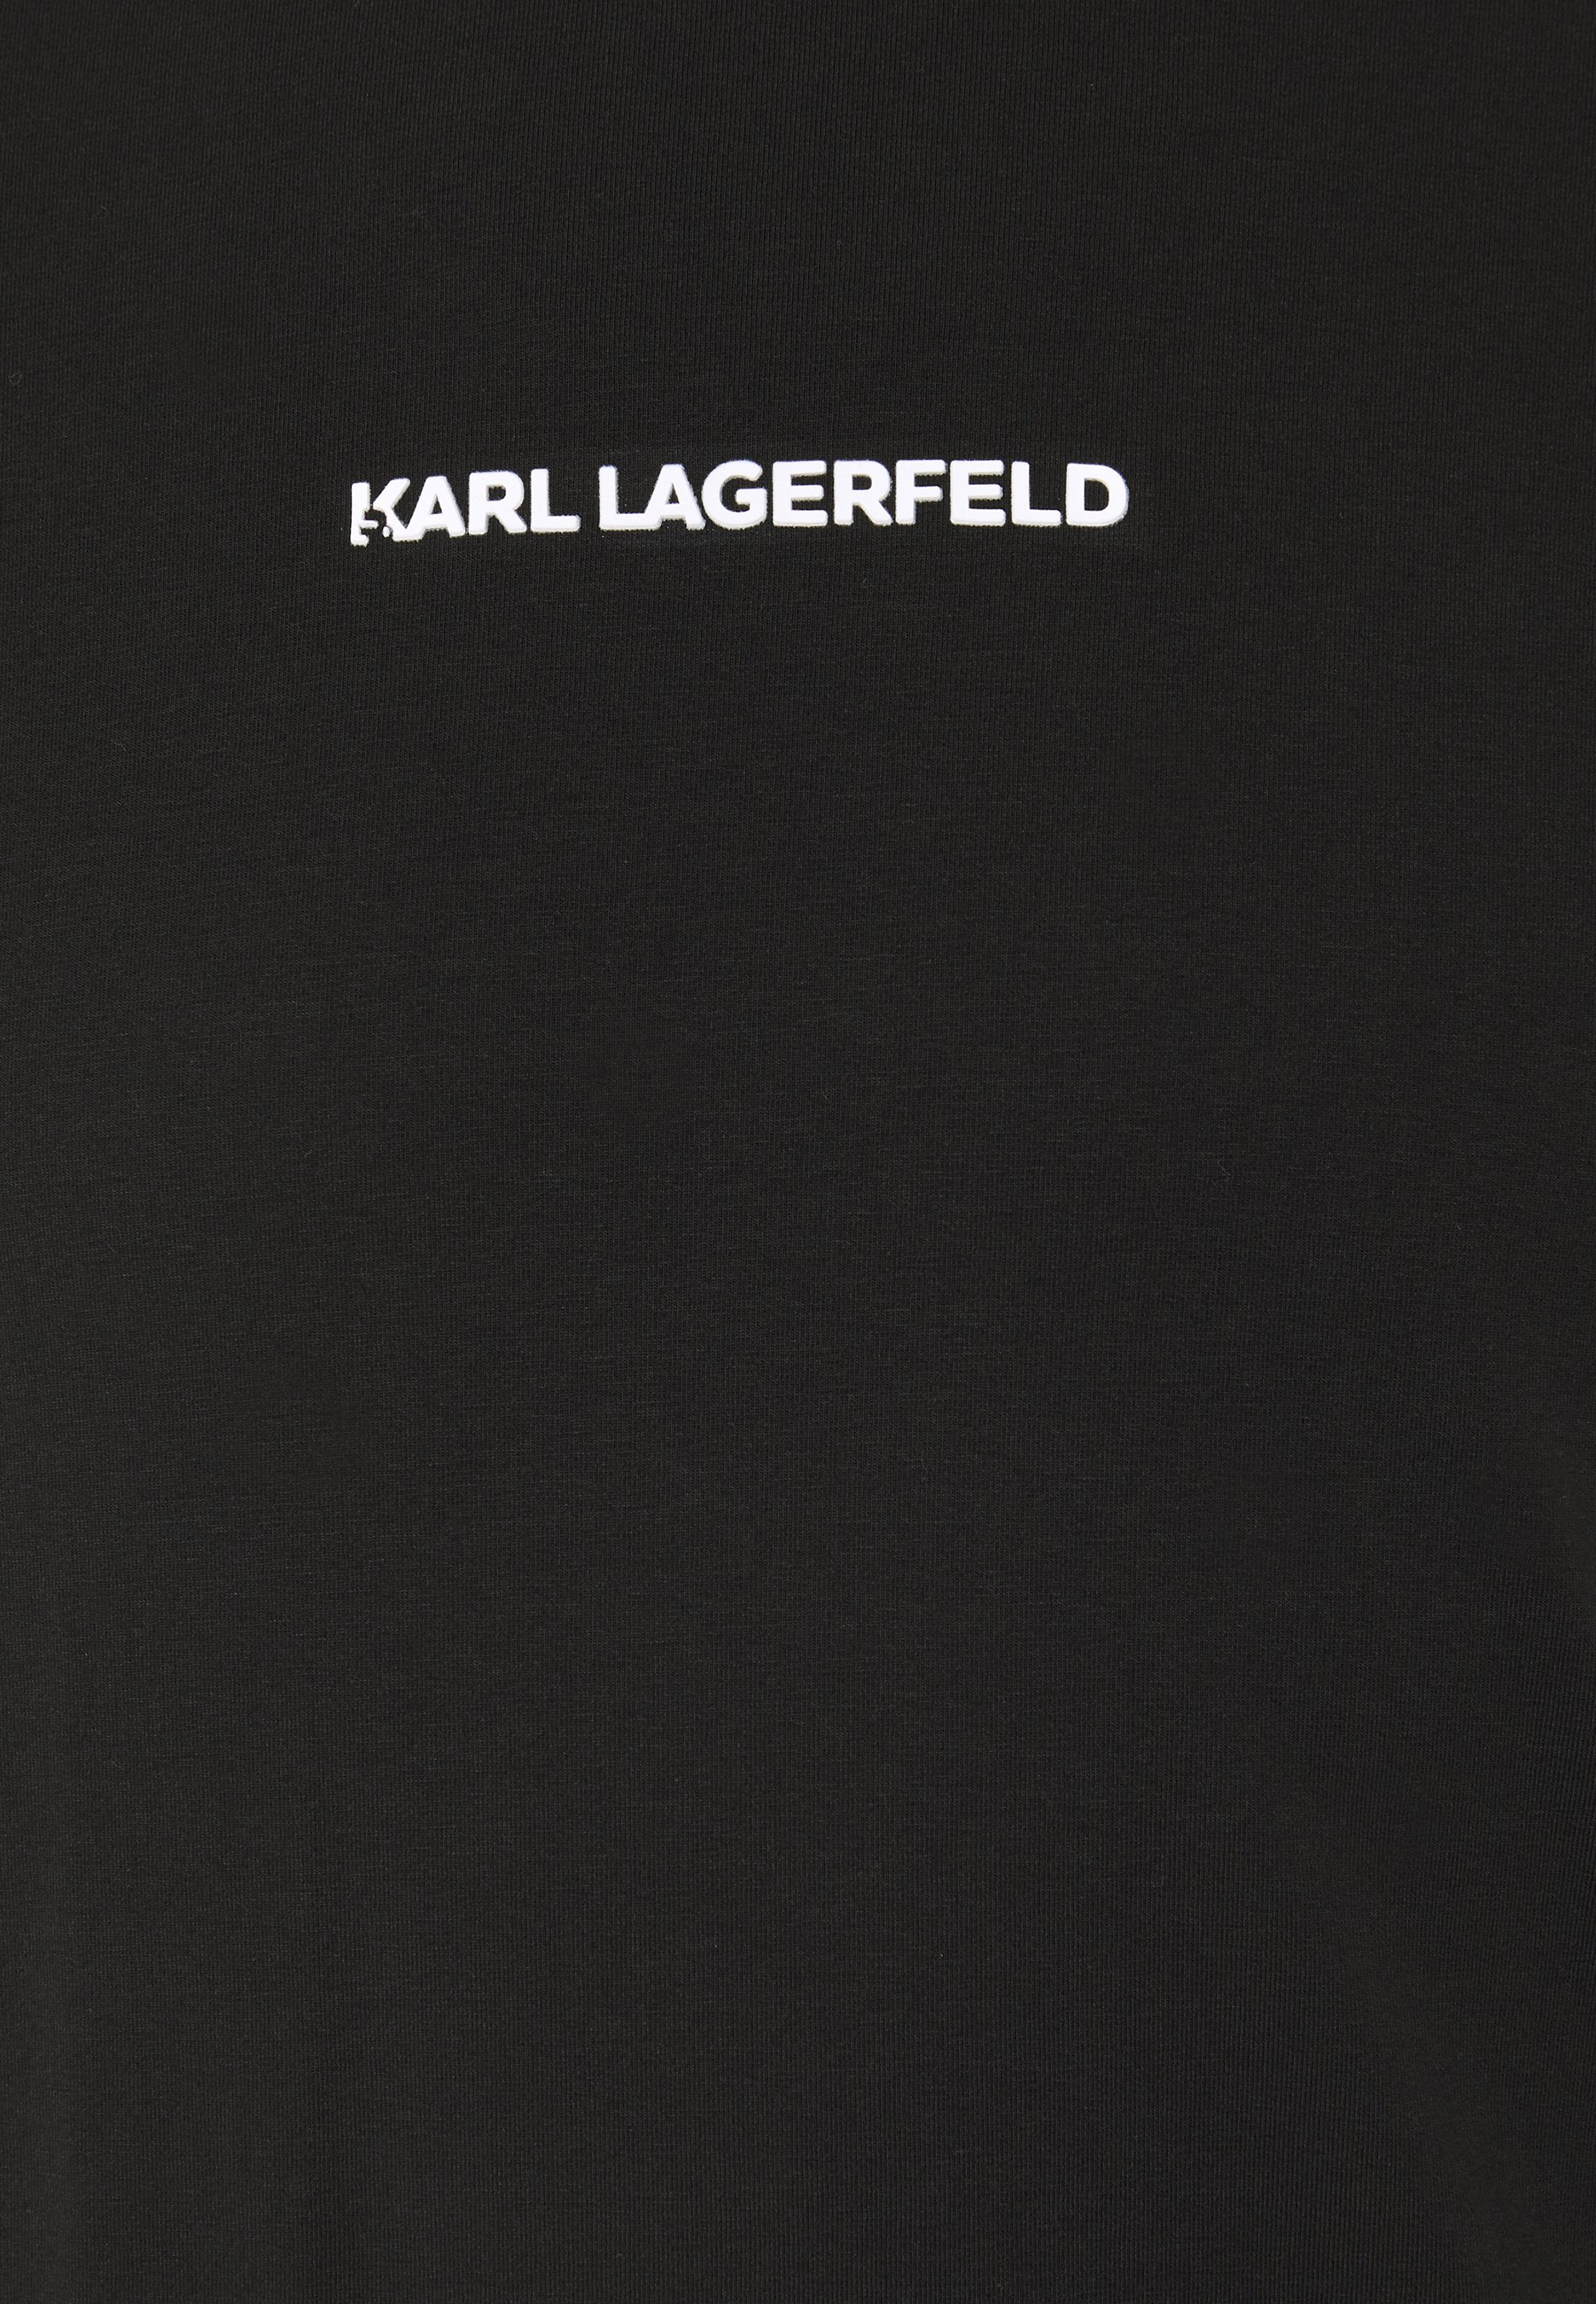 KARL LAGERFELD CREWNECK - Langarmshirt - black/schwarz - Herrenbekleidung 3Y1ne